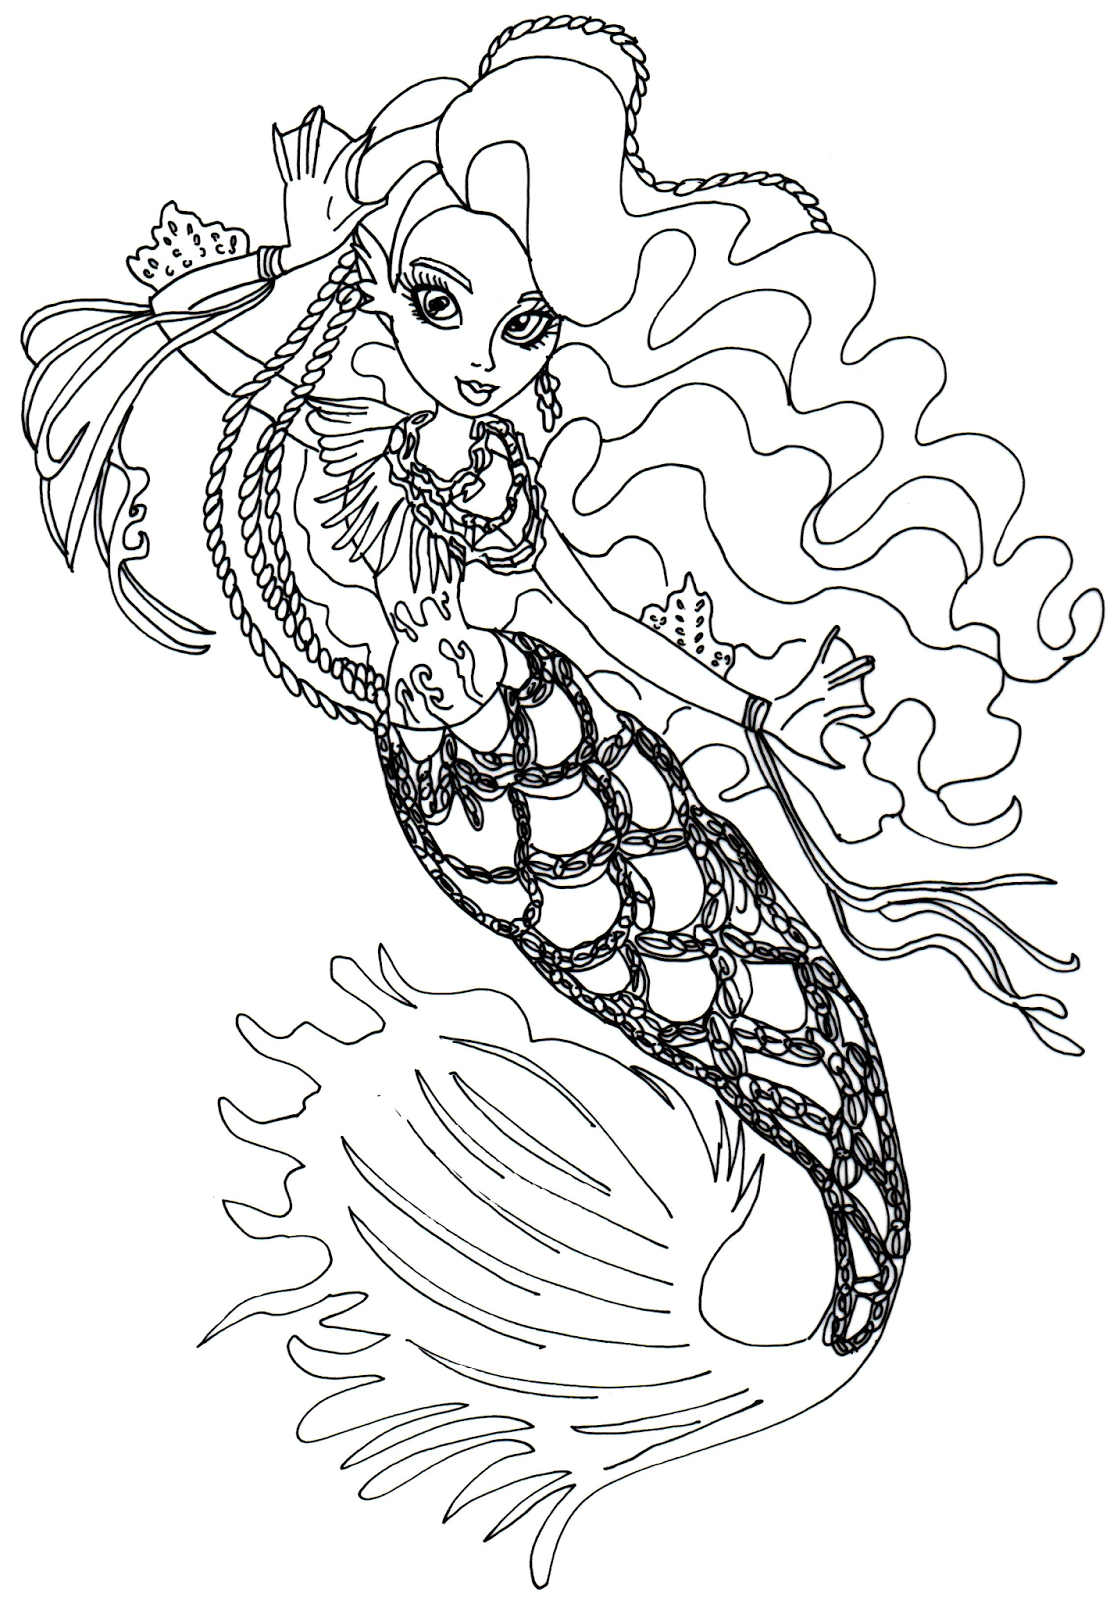 Monster High Free Printables   Free Printable Monster High Coloring - Monster High Free Printable Pictures